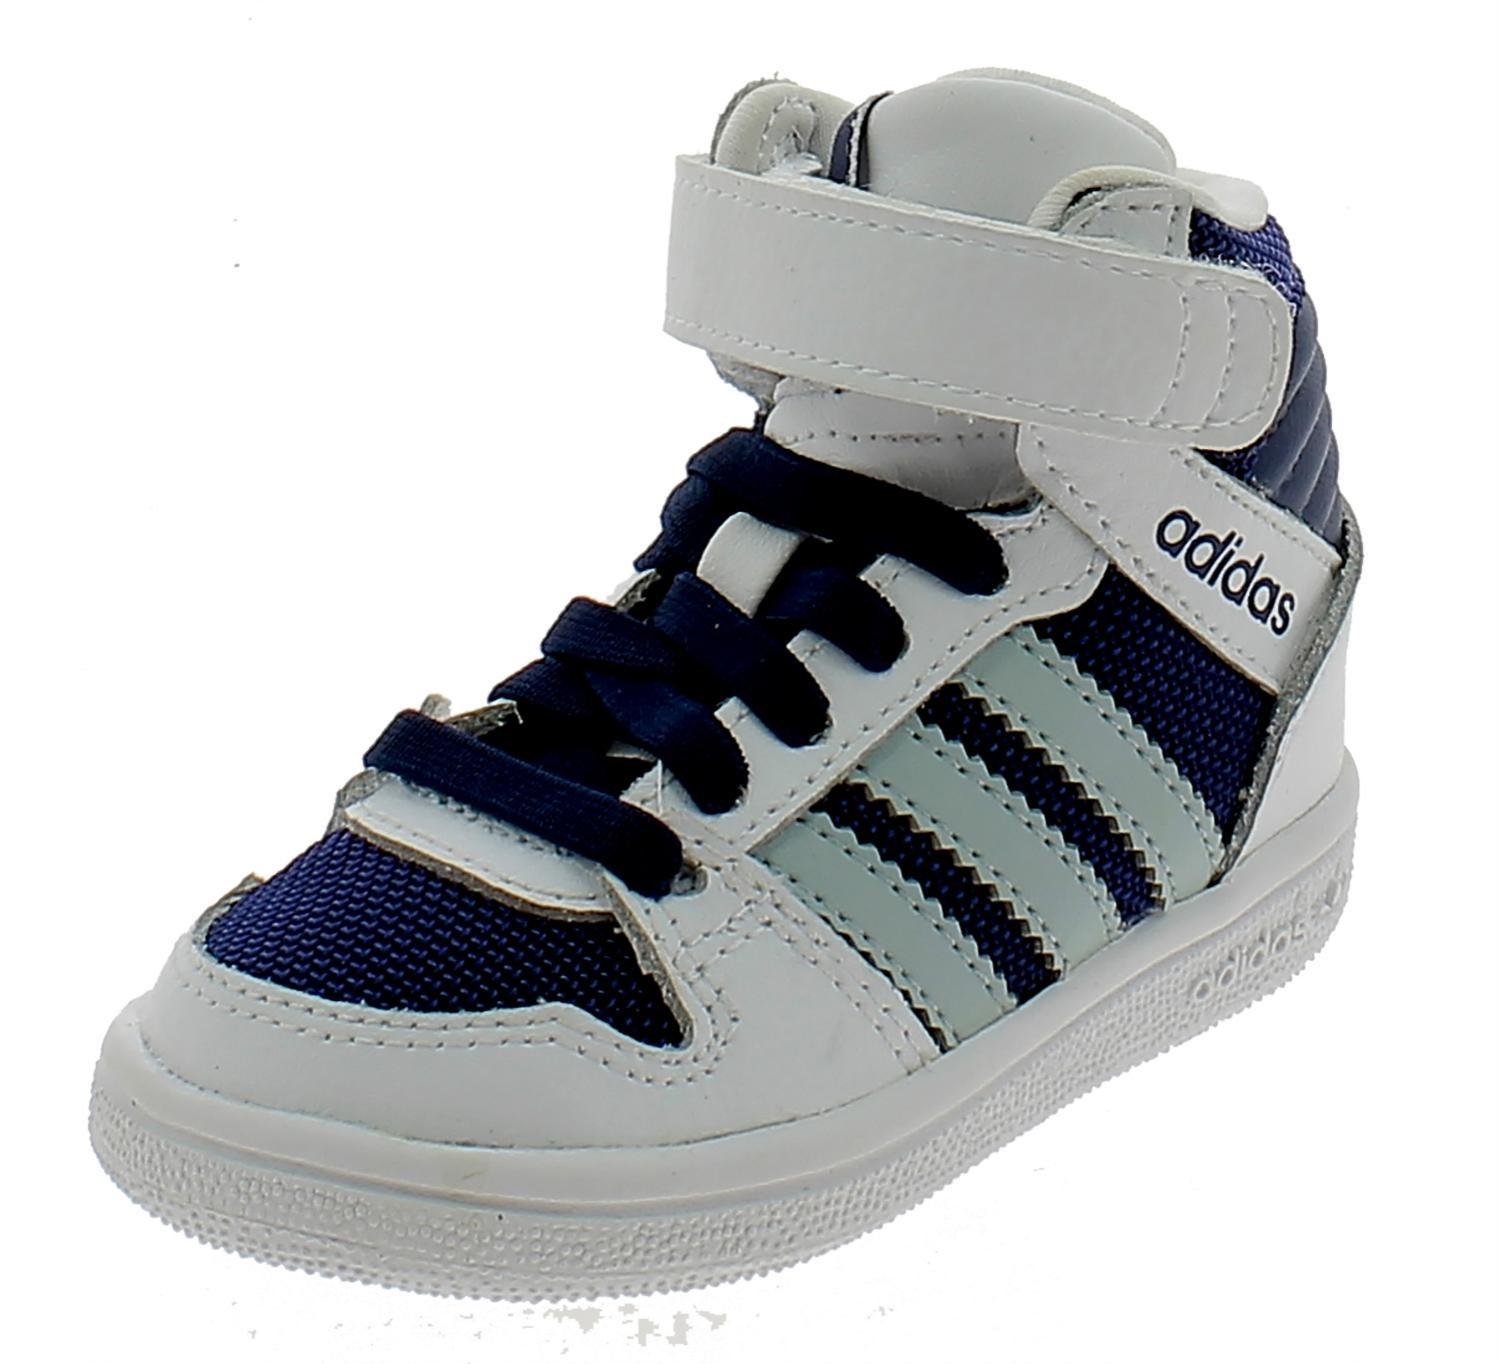 adidas adidas pro play 2 cf i scarpe sportive bambino bianco blu lacci strappi b25720